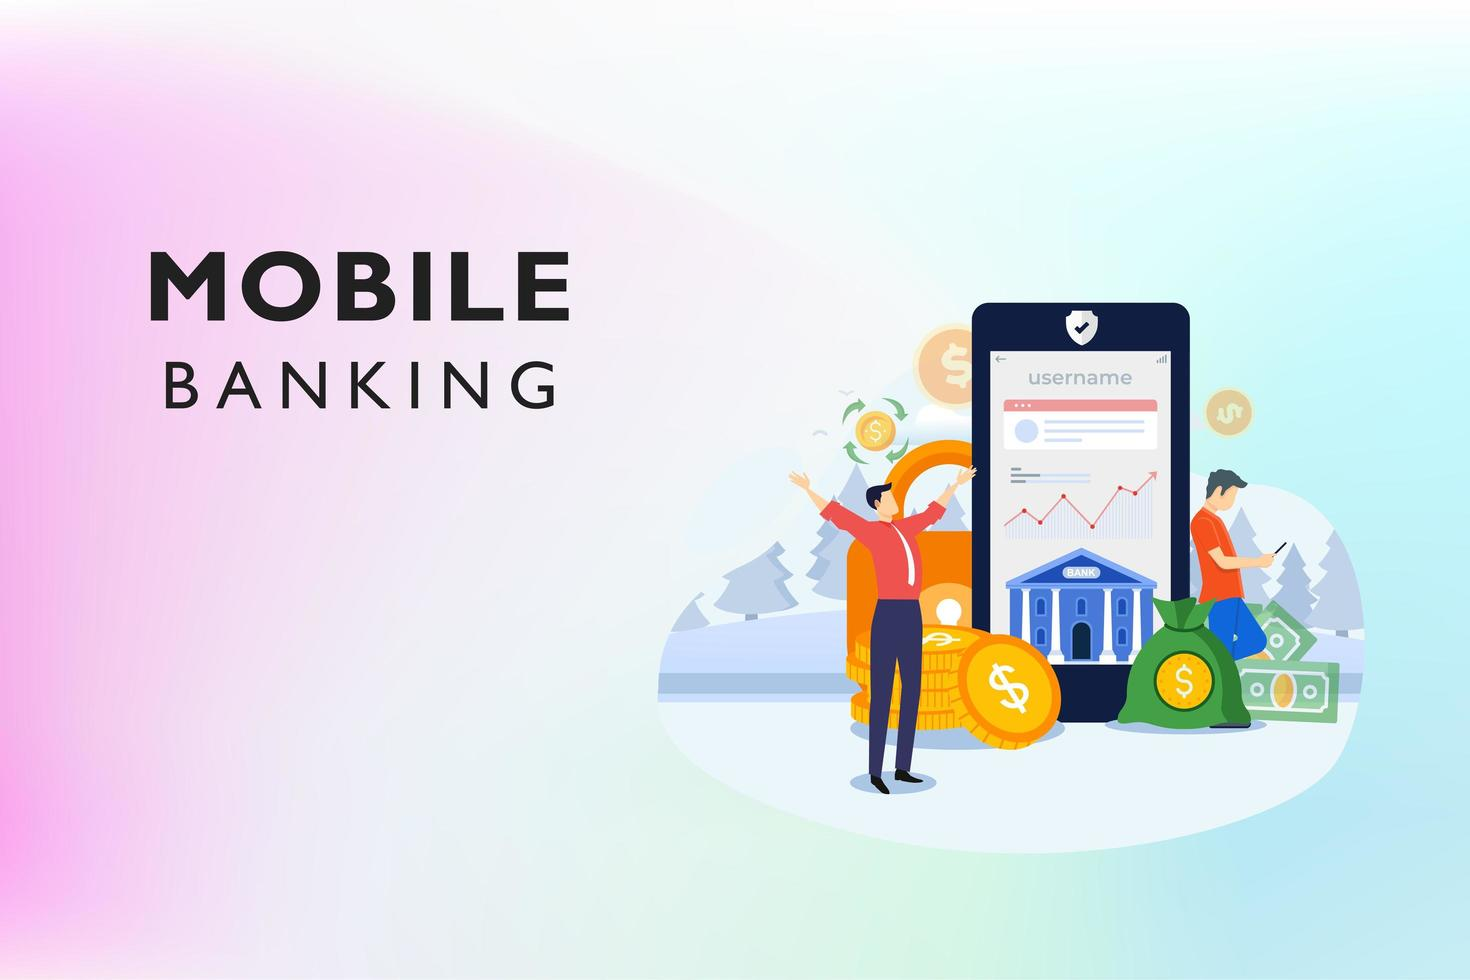 mobile banking online con denaro vettore